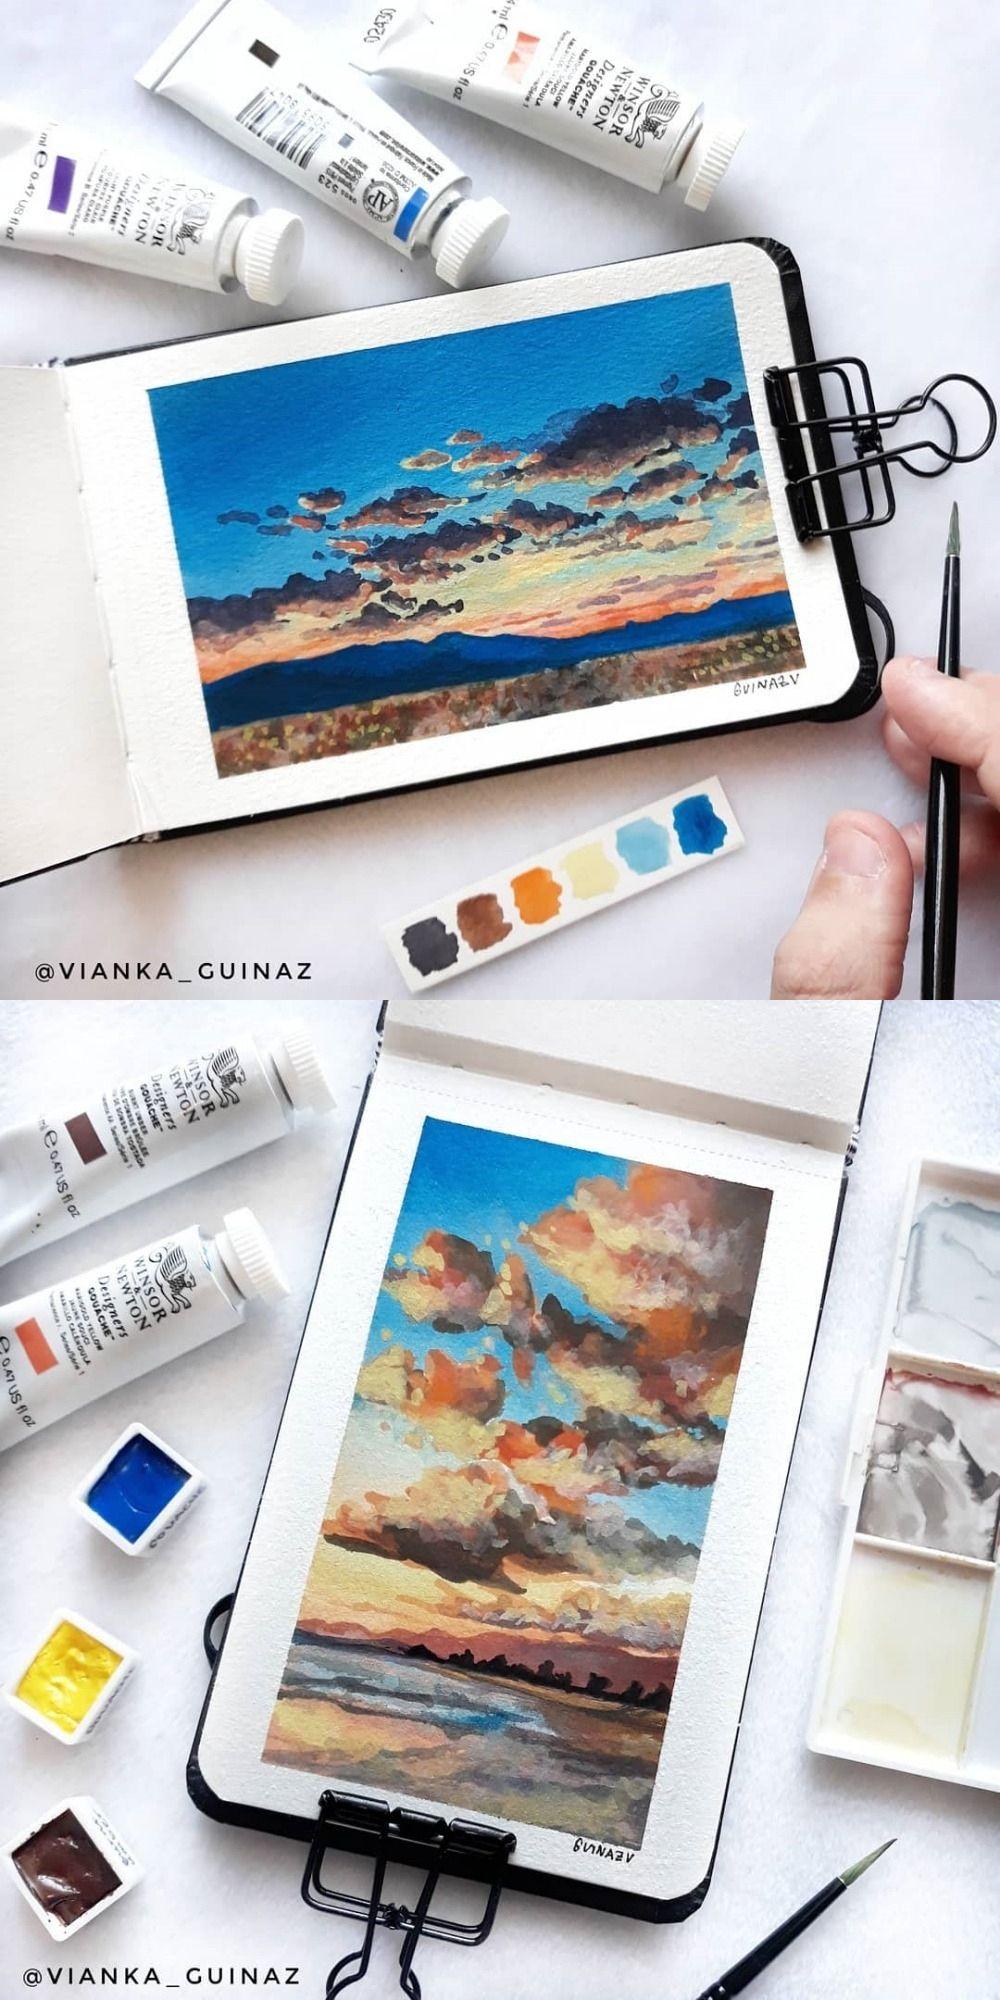 Vianka Guinaz on Instagram #art #painting #watercolor #gouache #sketchbook #clouds #sky #landscape #sunset #sunrise #dusk #dawn #landscapephoto